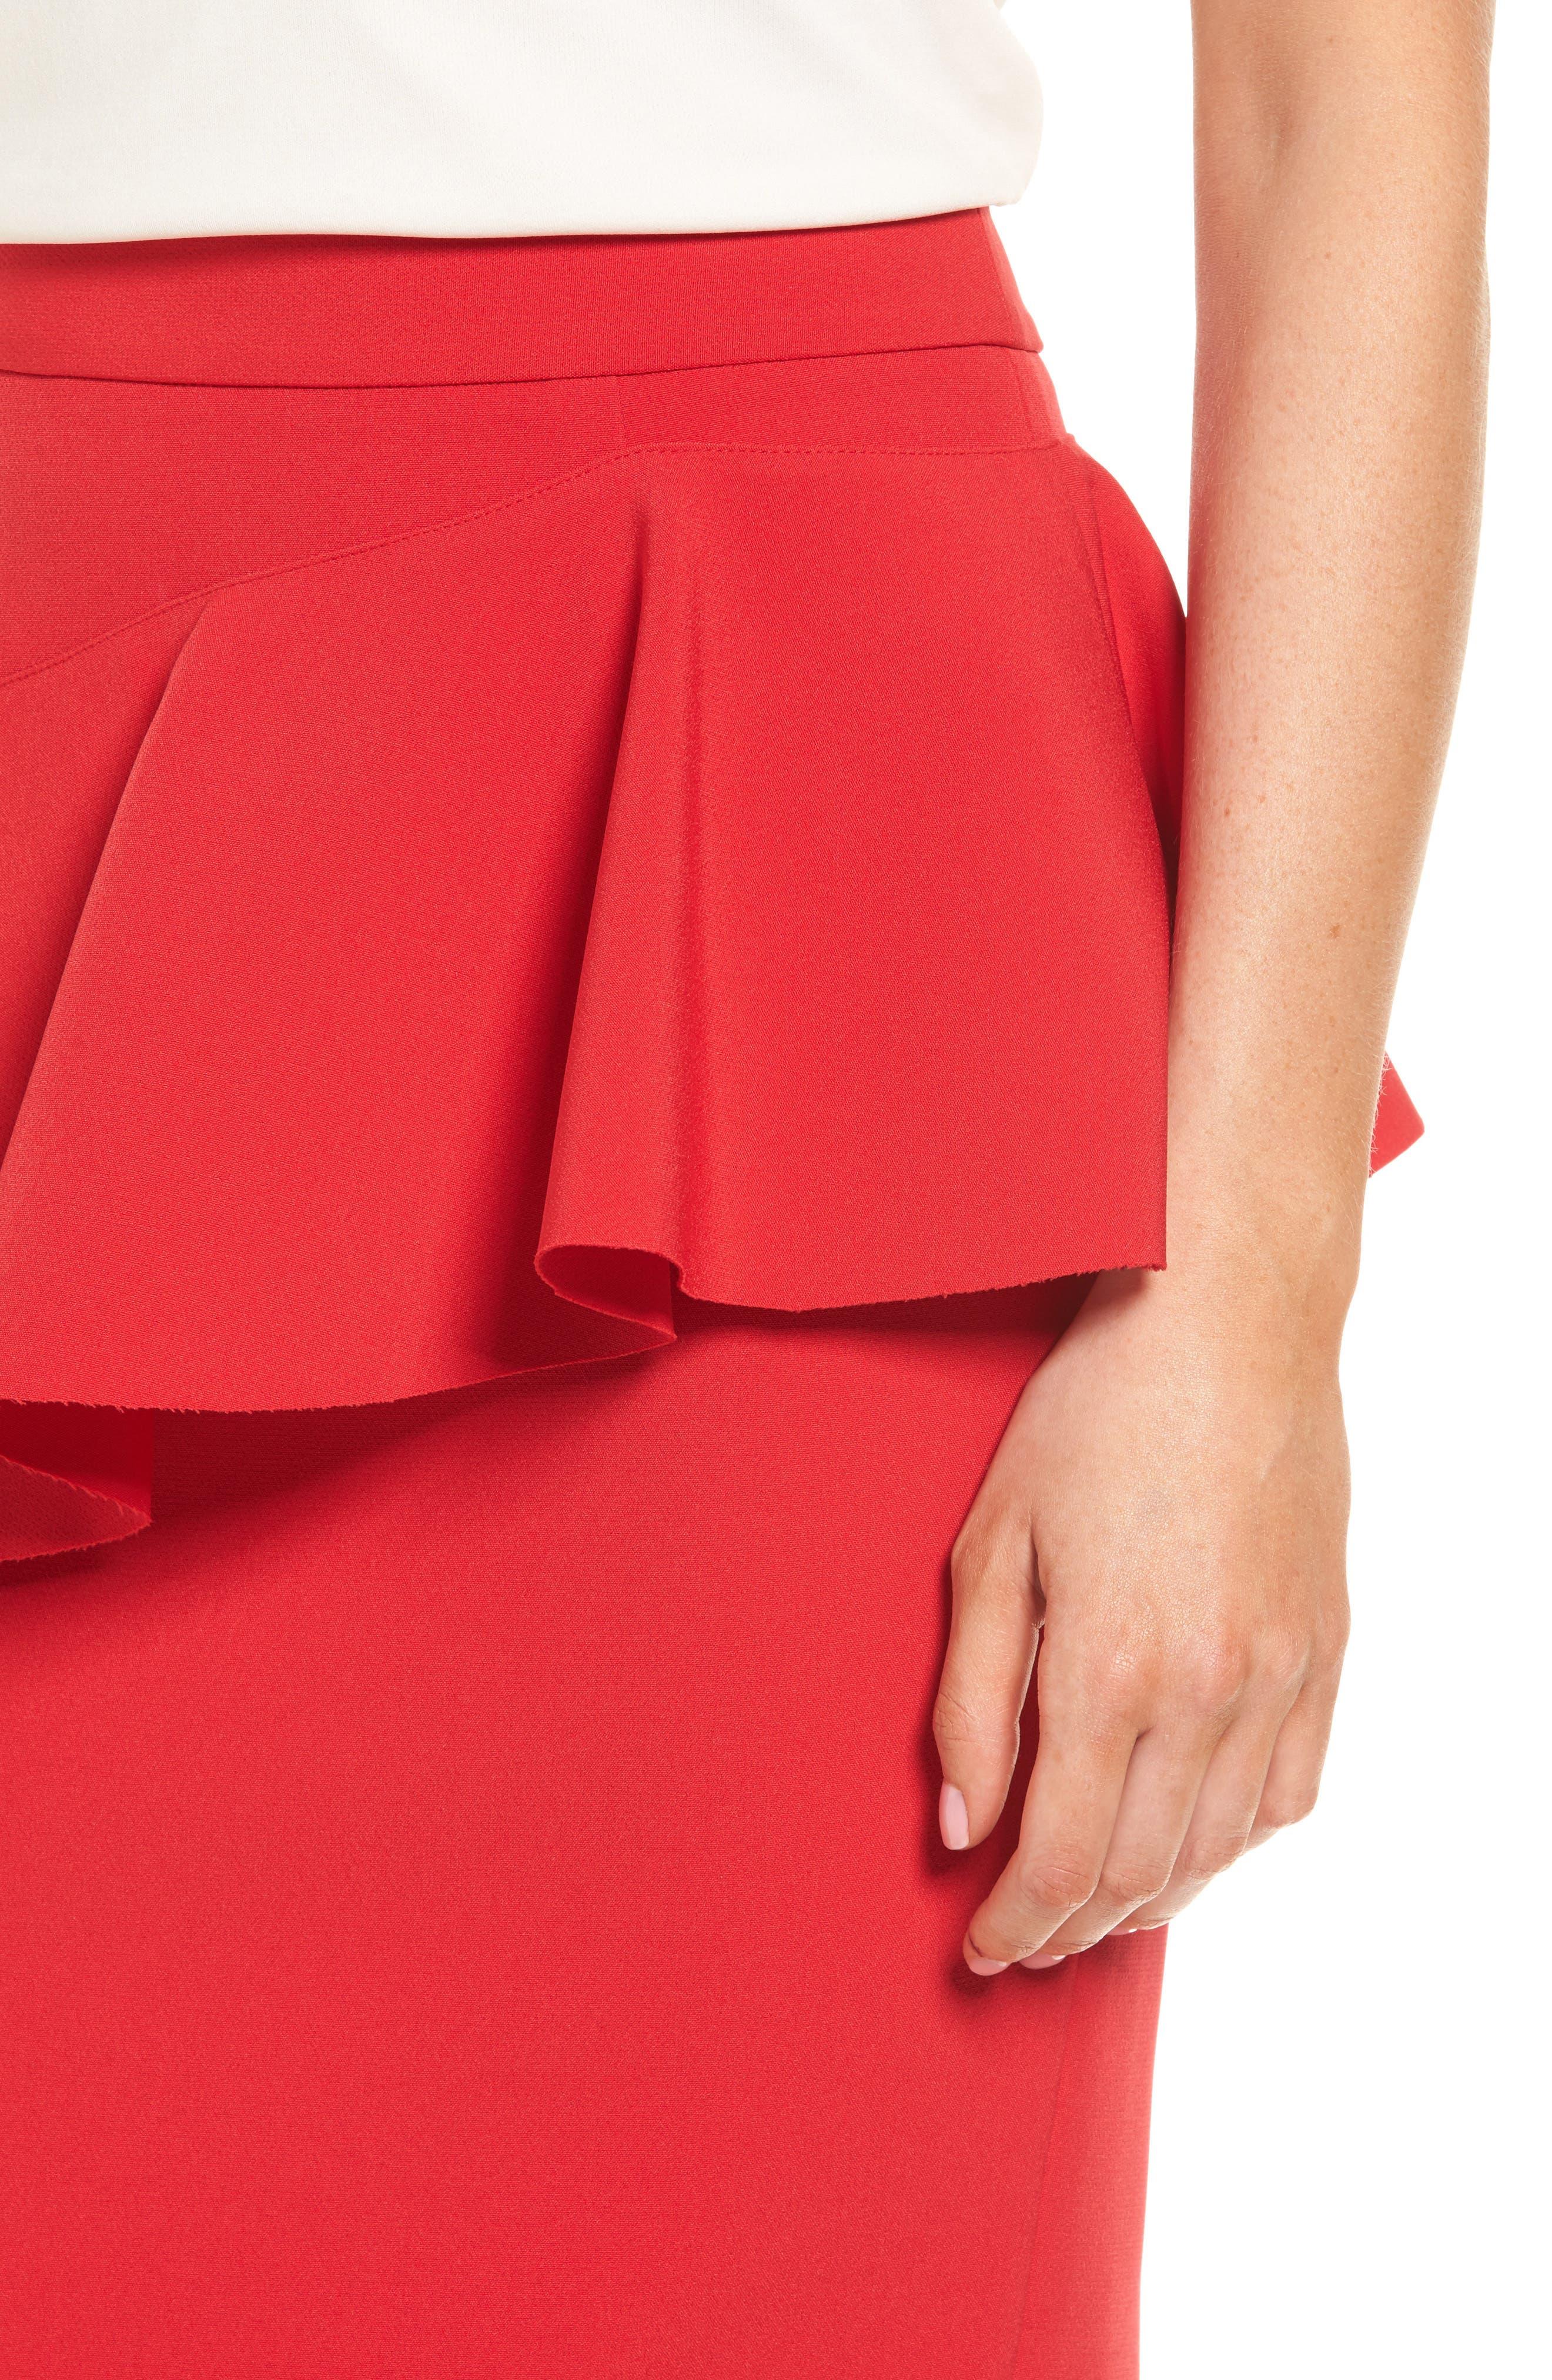 Ruffle Detail Pencil Skirt,                             Alternate thumbnail 8, color,